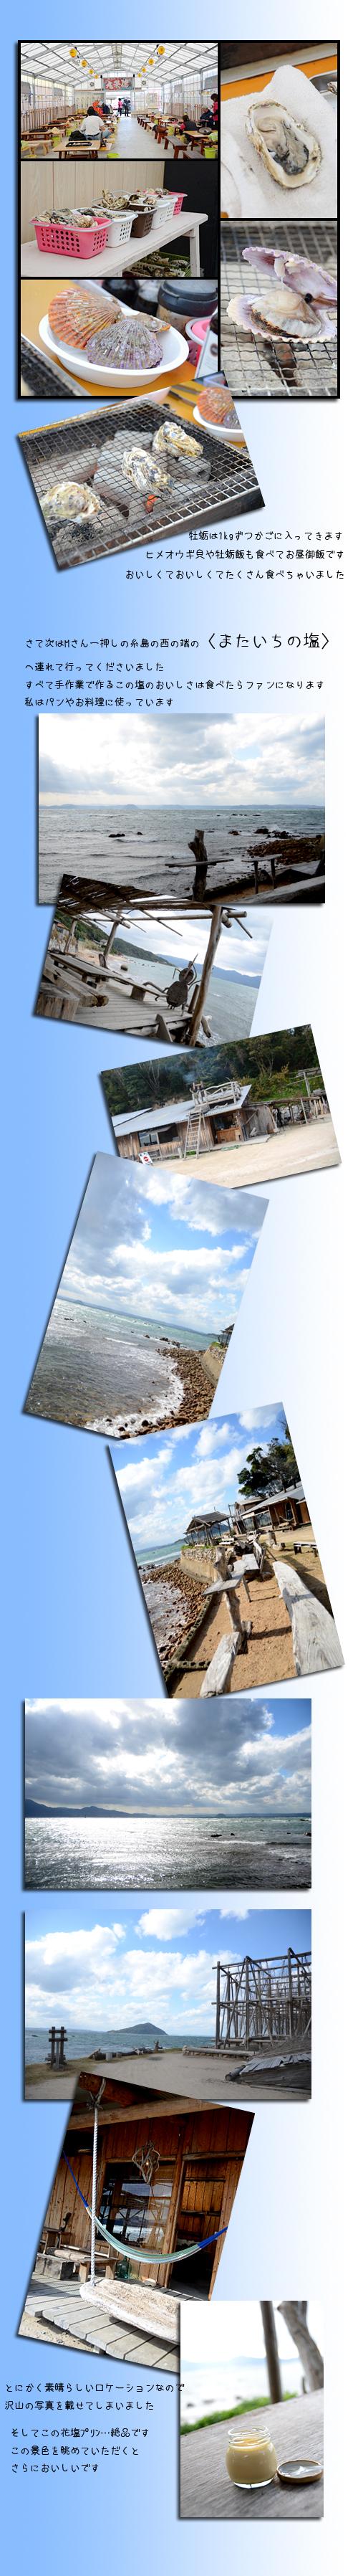 11月21日糸島2